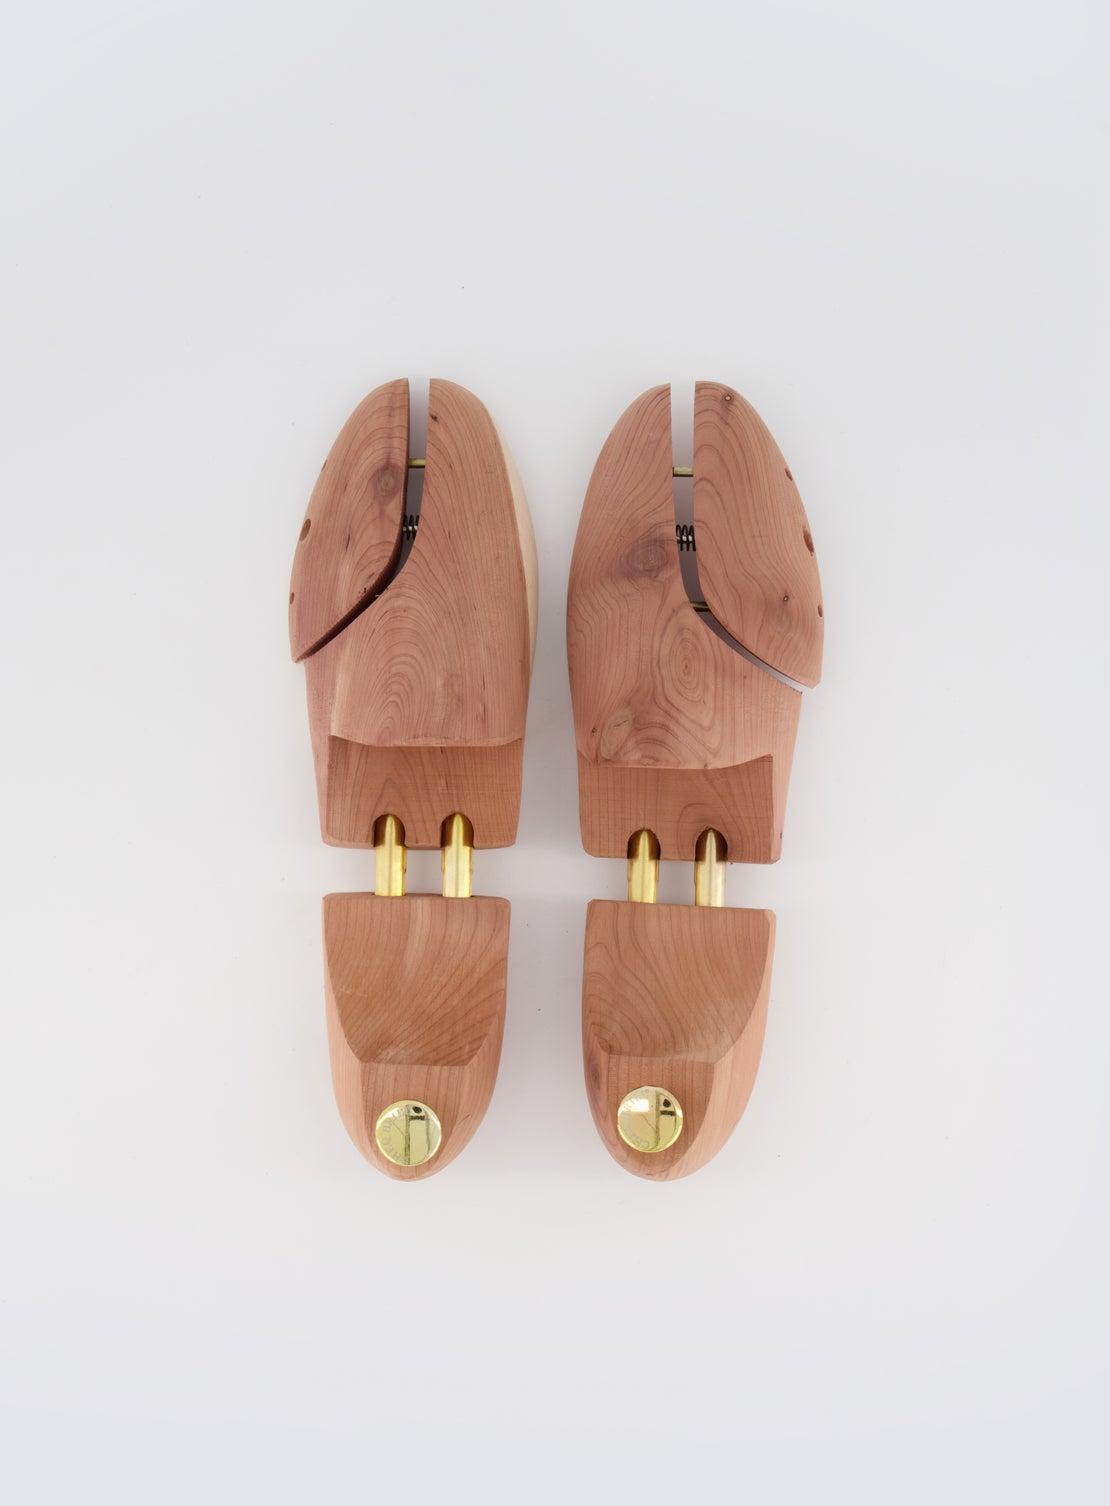 Wooden Shoe Tree w/ Gold Detail